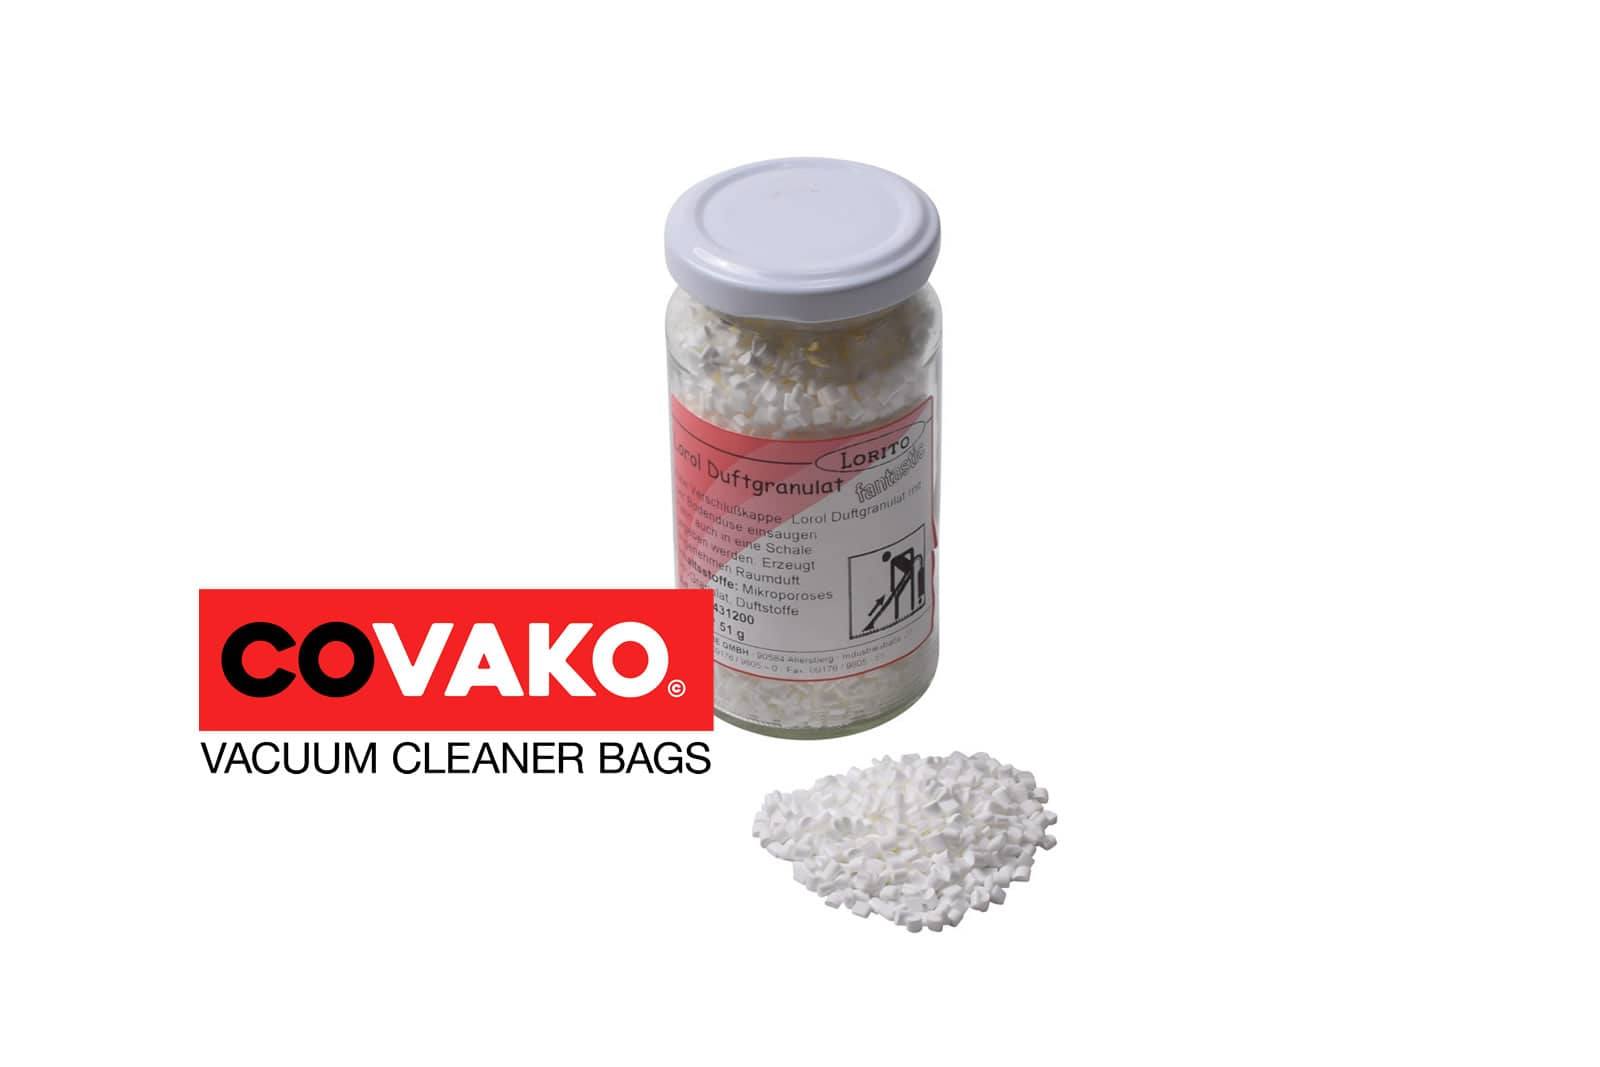 Duftstoffe / Part Item - Duftstoffevacuum cleaner bags